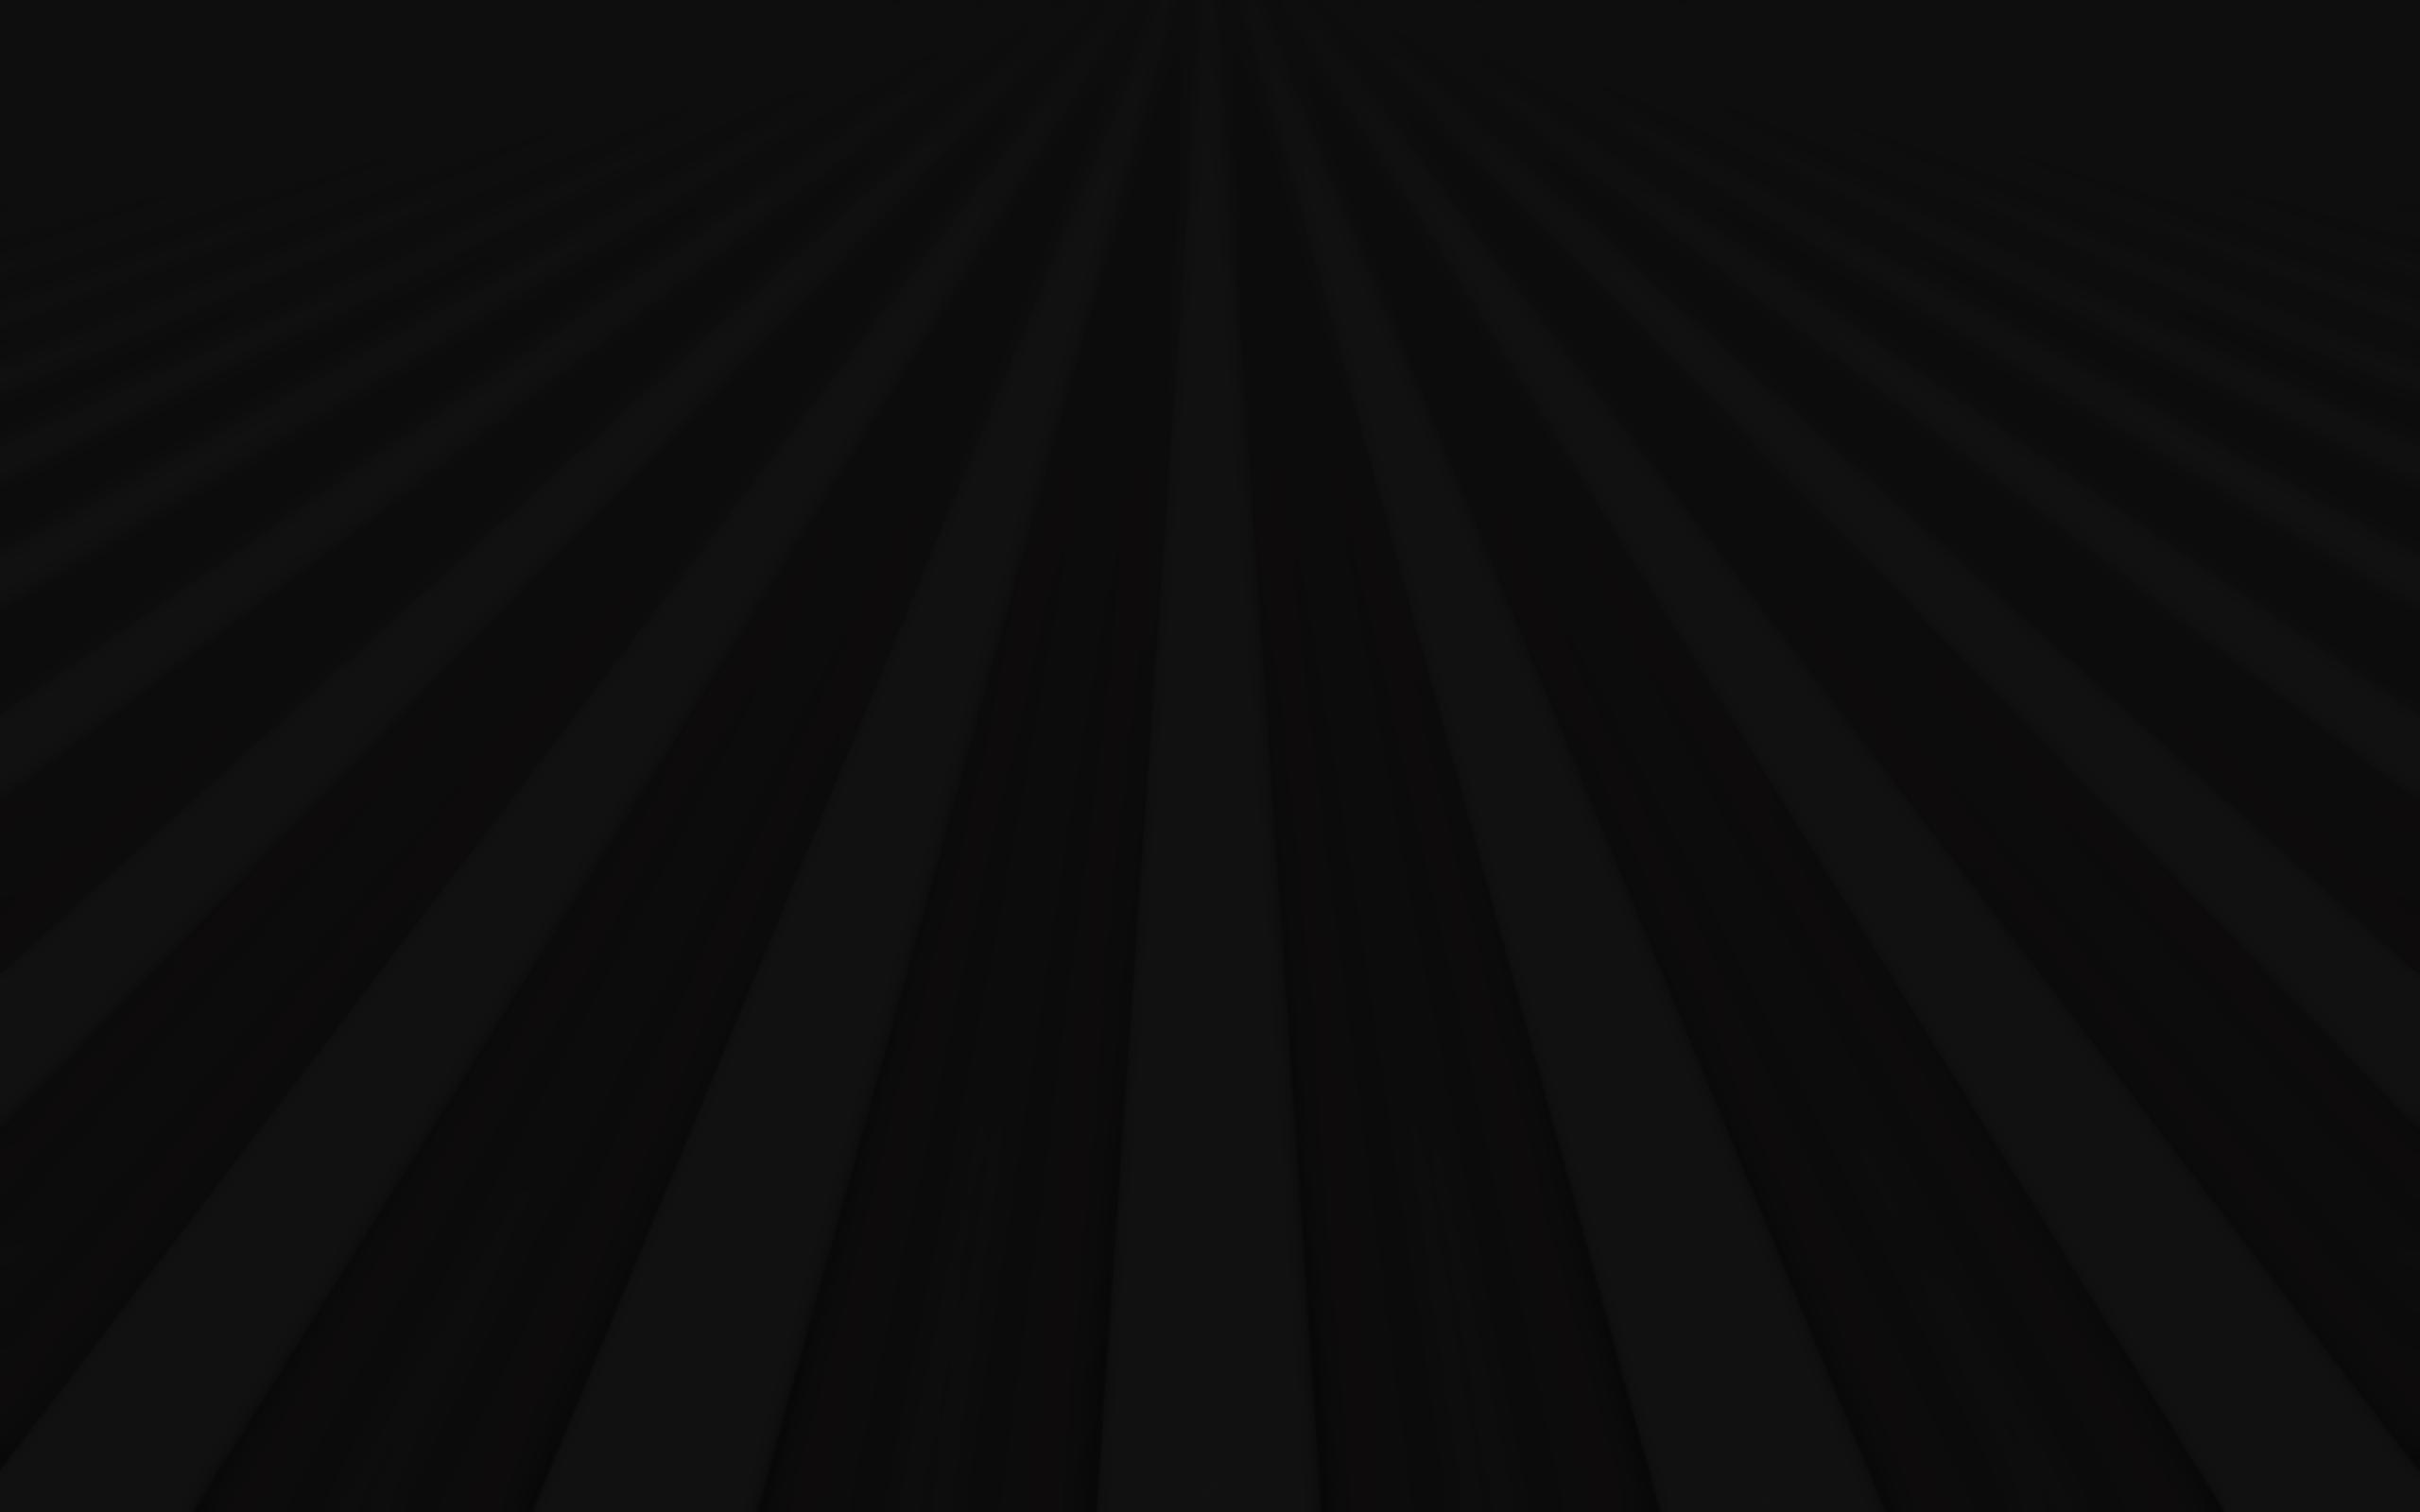 gris hq fondo negro - photo #6